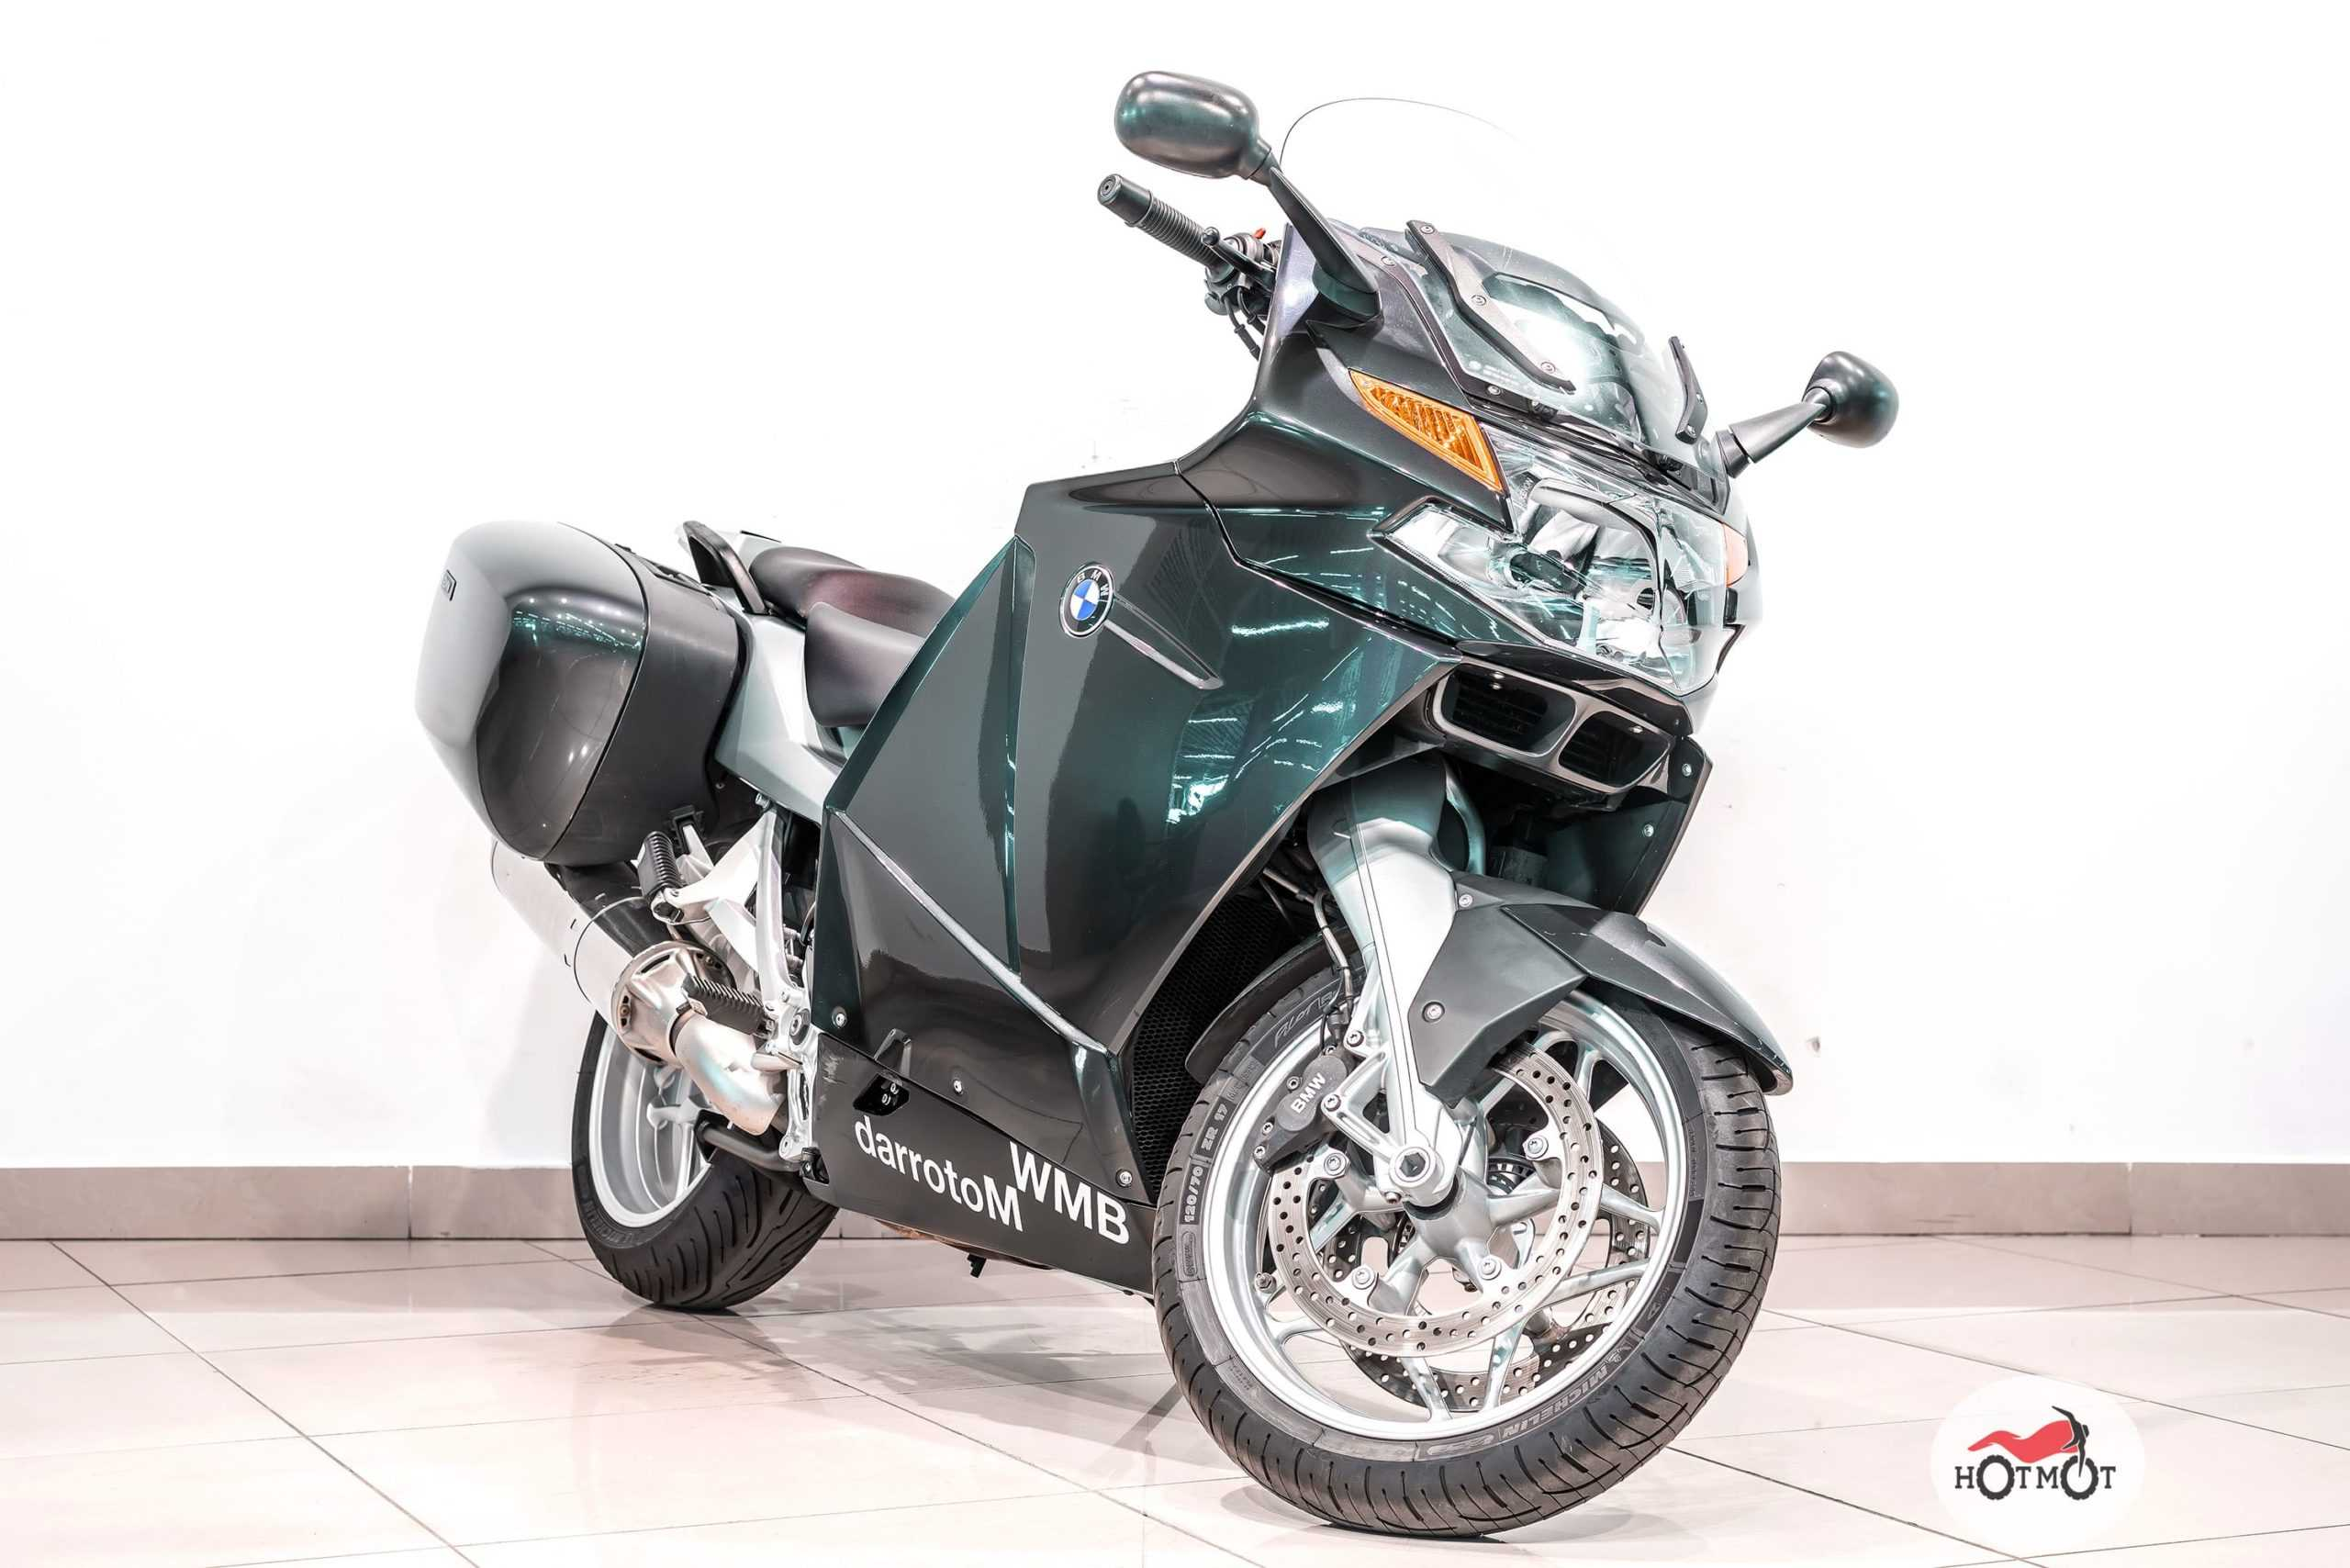 Обзор мотоцикла BMW K 1200 GT   Интернет-магазин «ХОТМОТ»